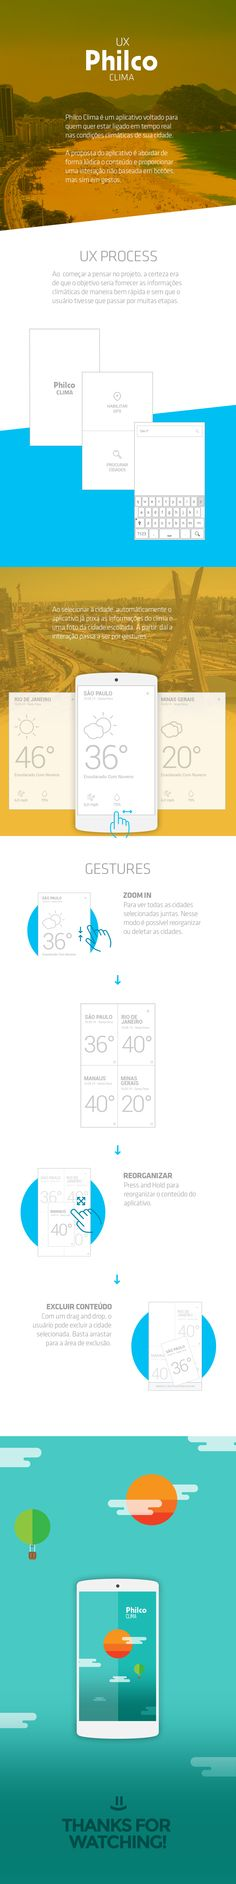 UX | App Philco Clima on Behance